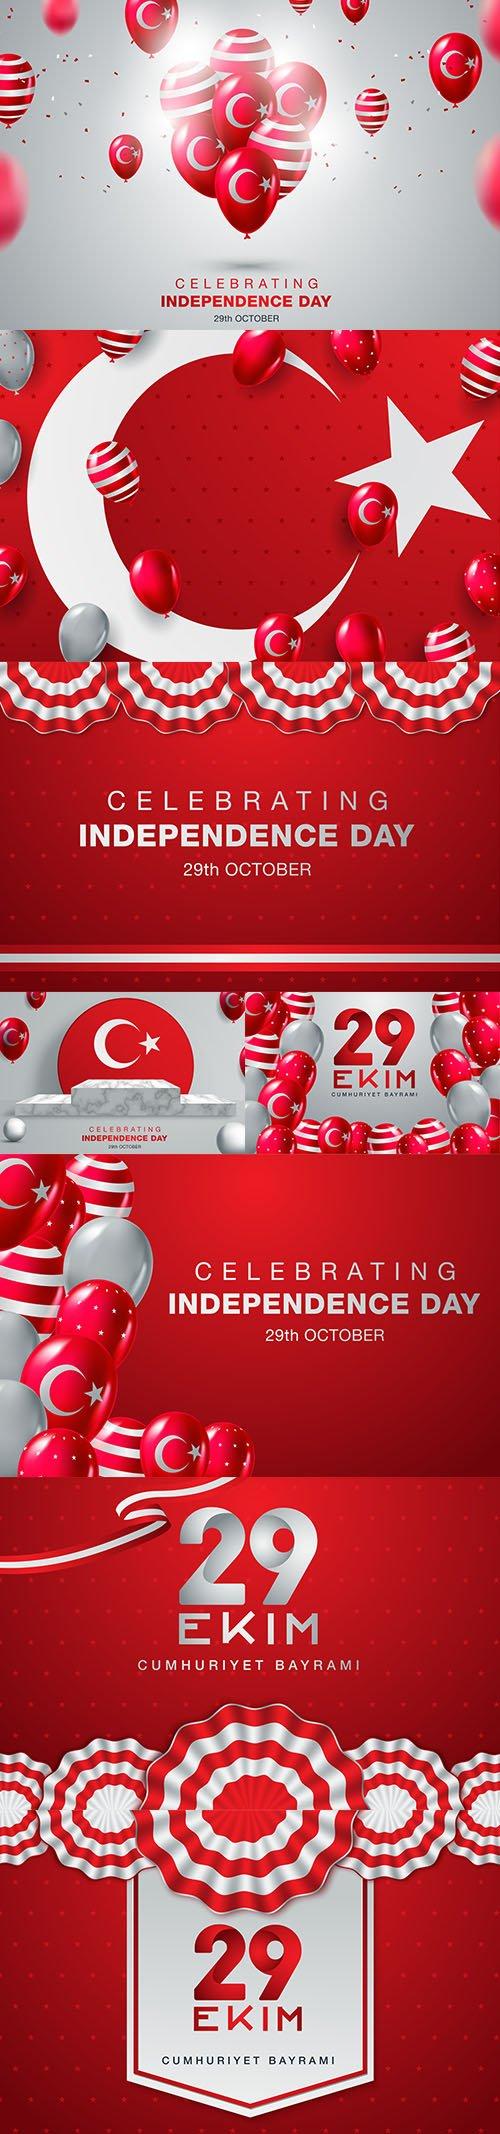 National Republic Day Turkey 29th October Set